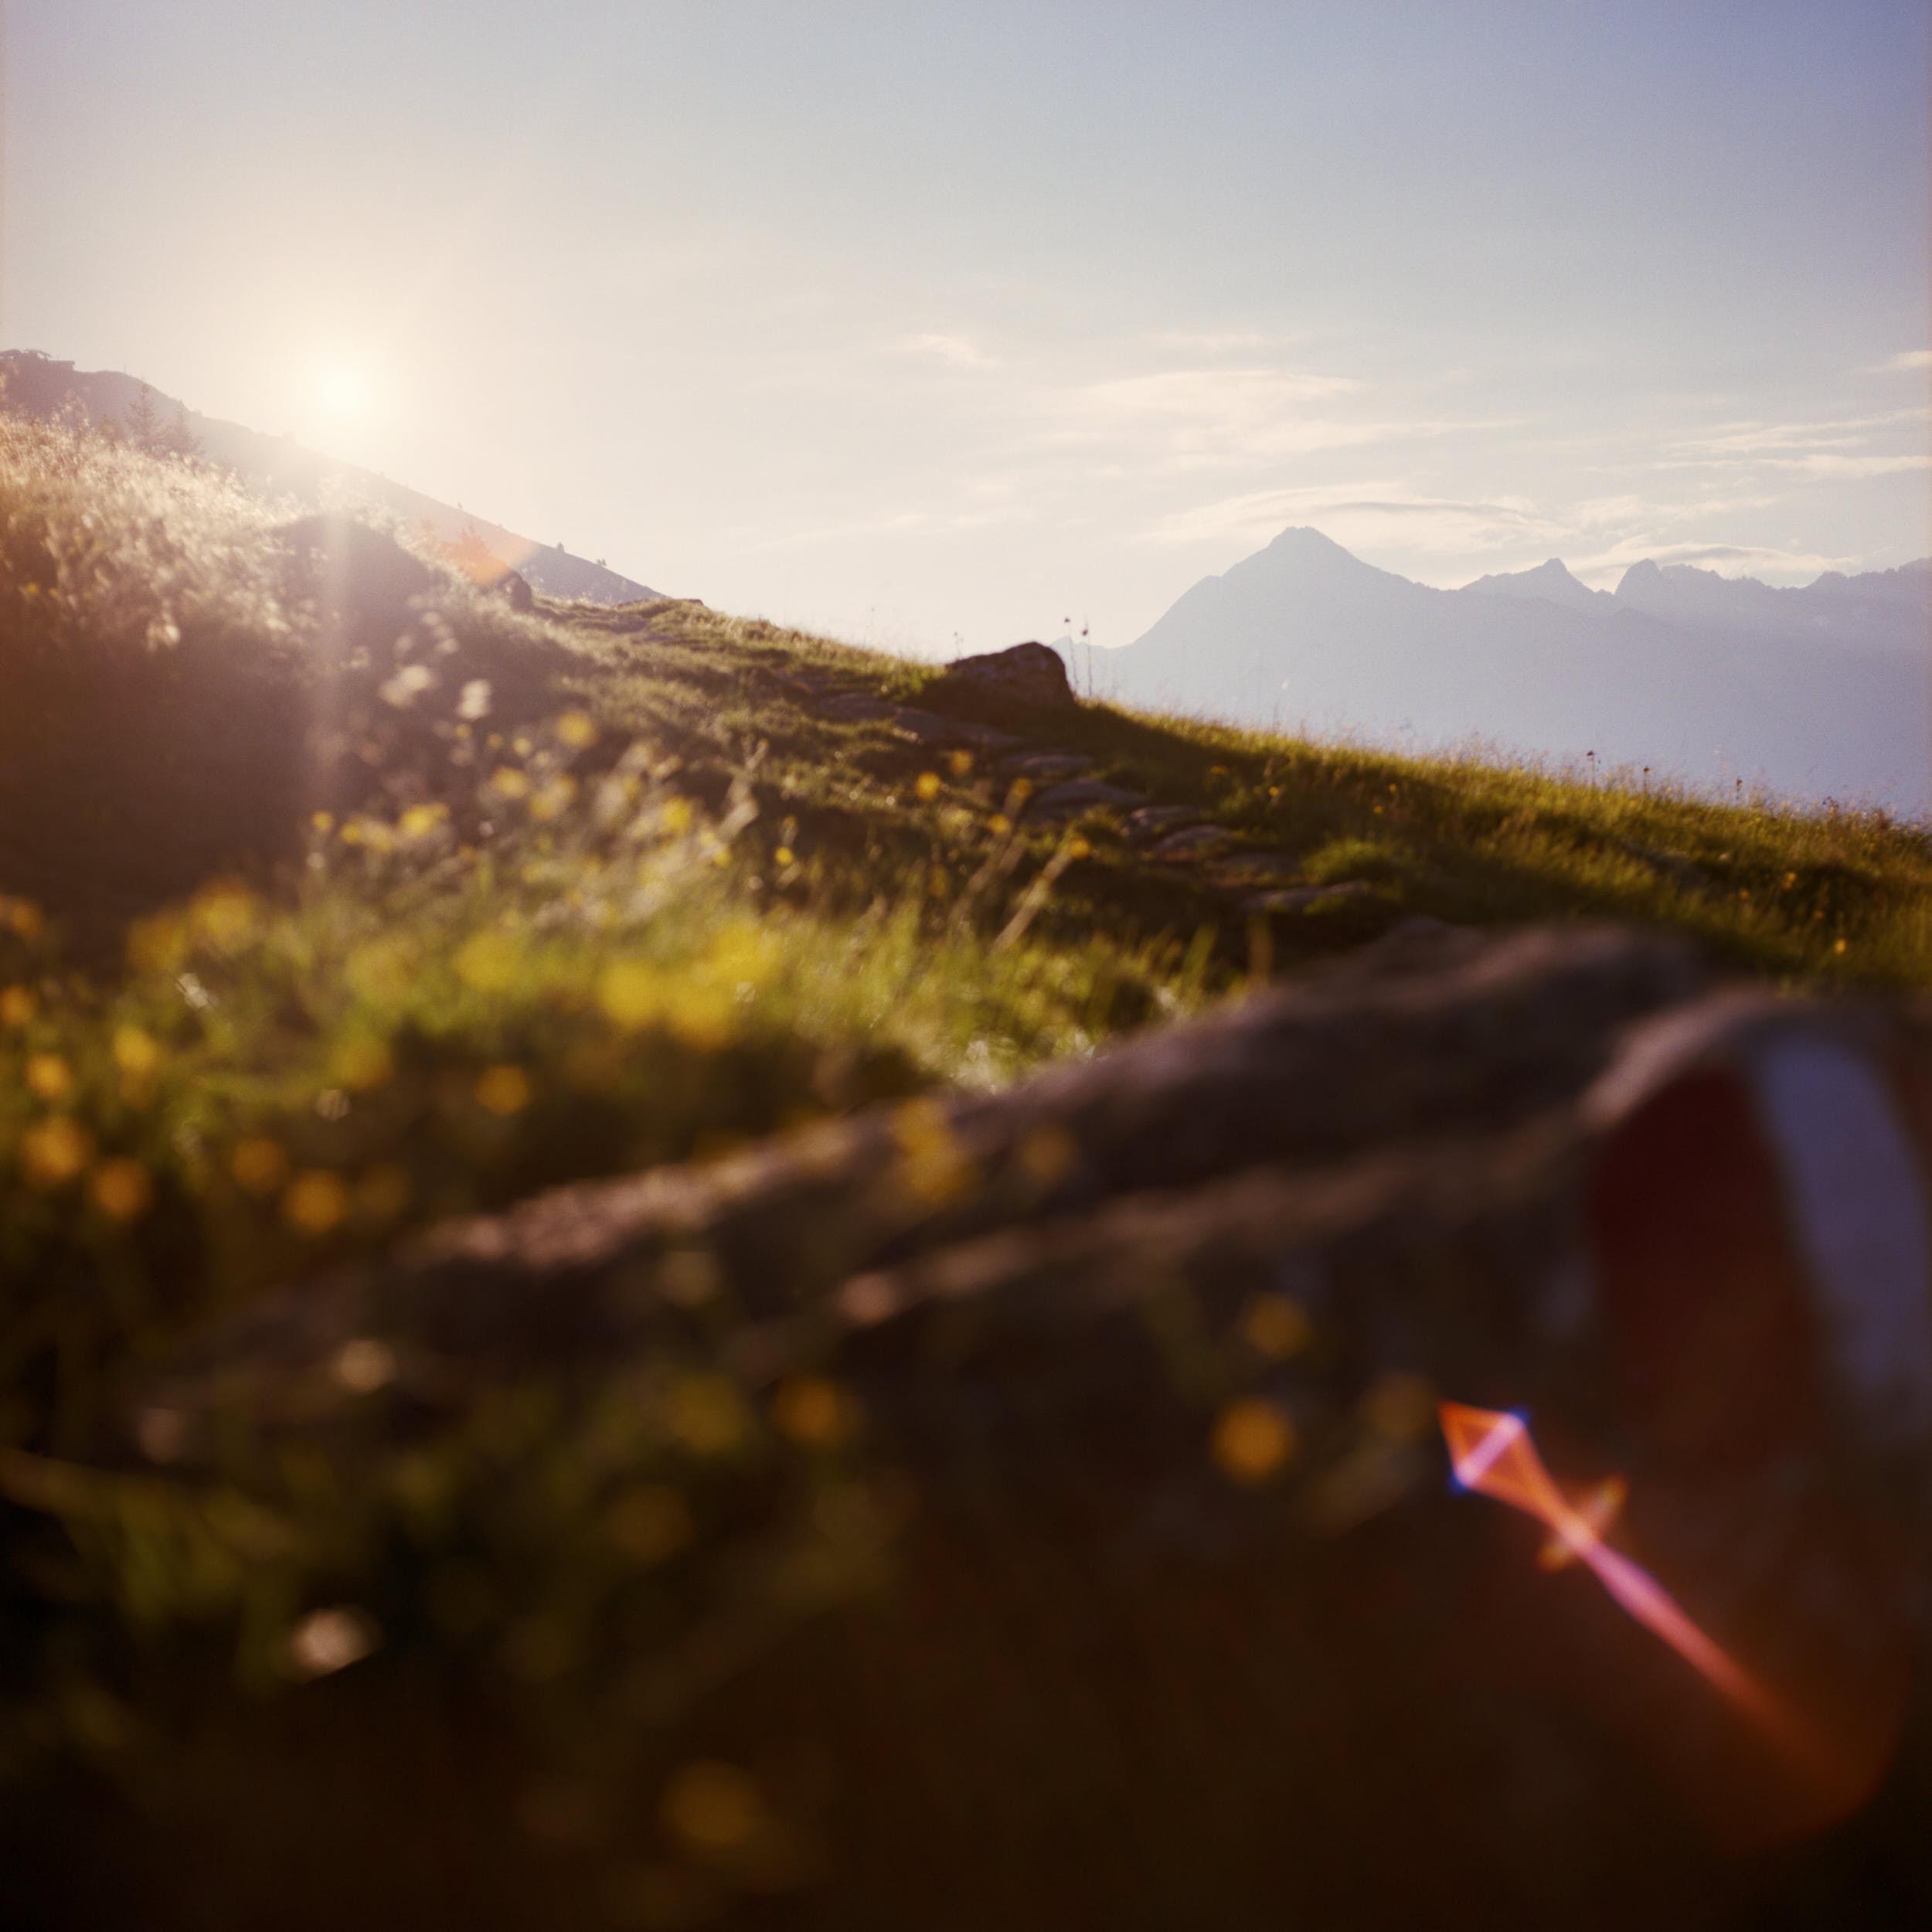 First sunlight hitting the top of alpine peaks. Shot on medium format color film.